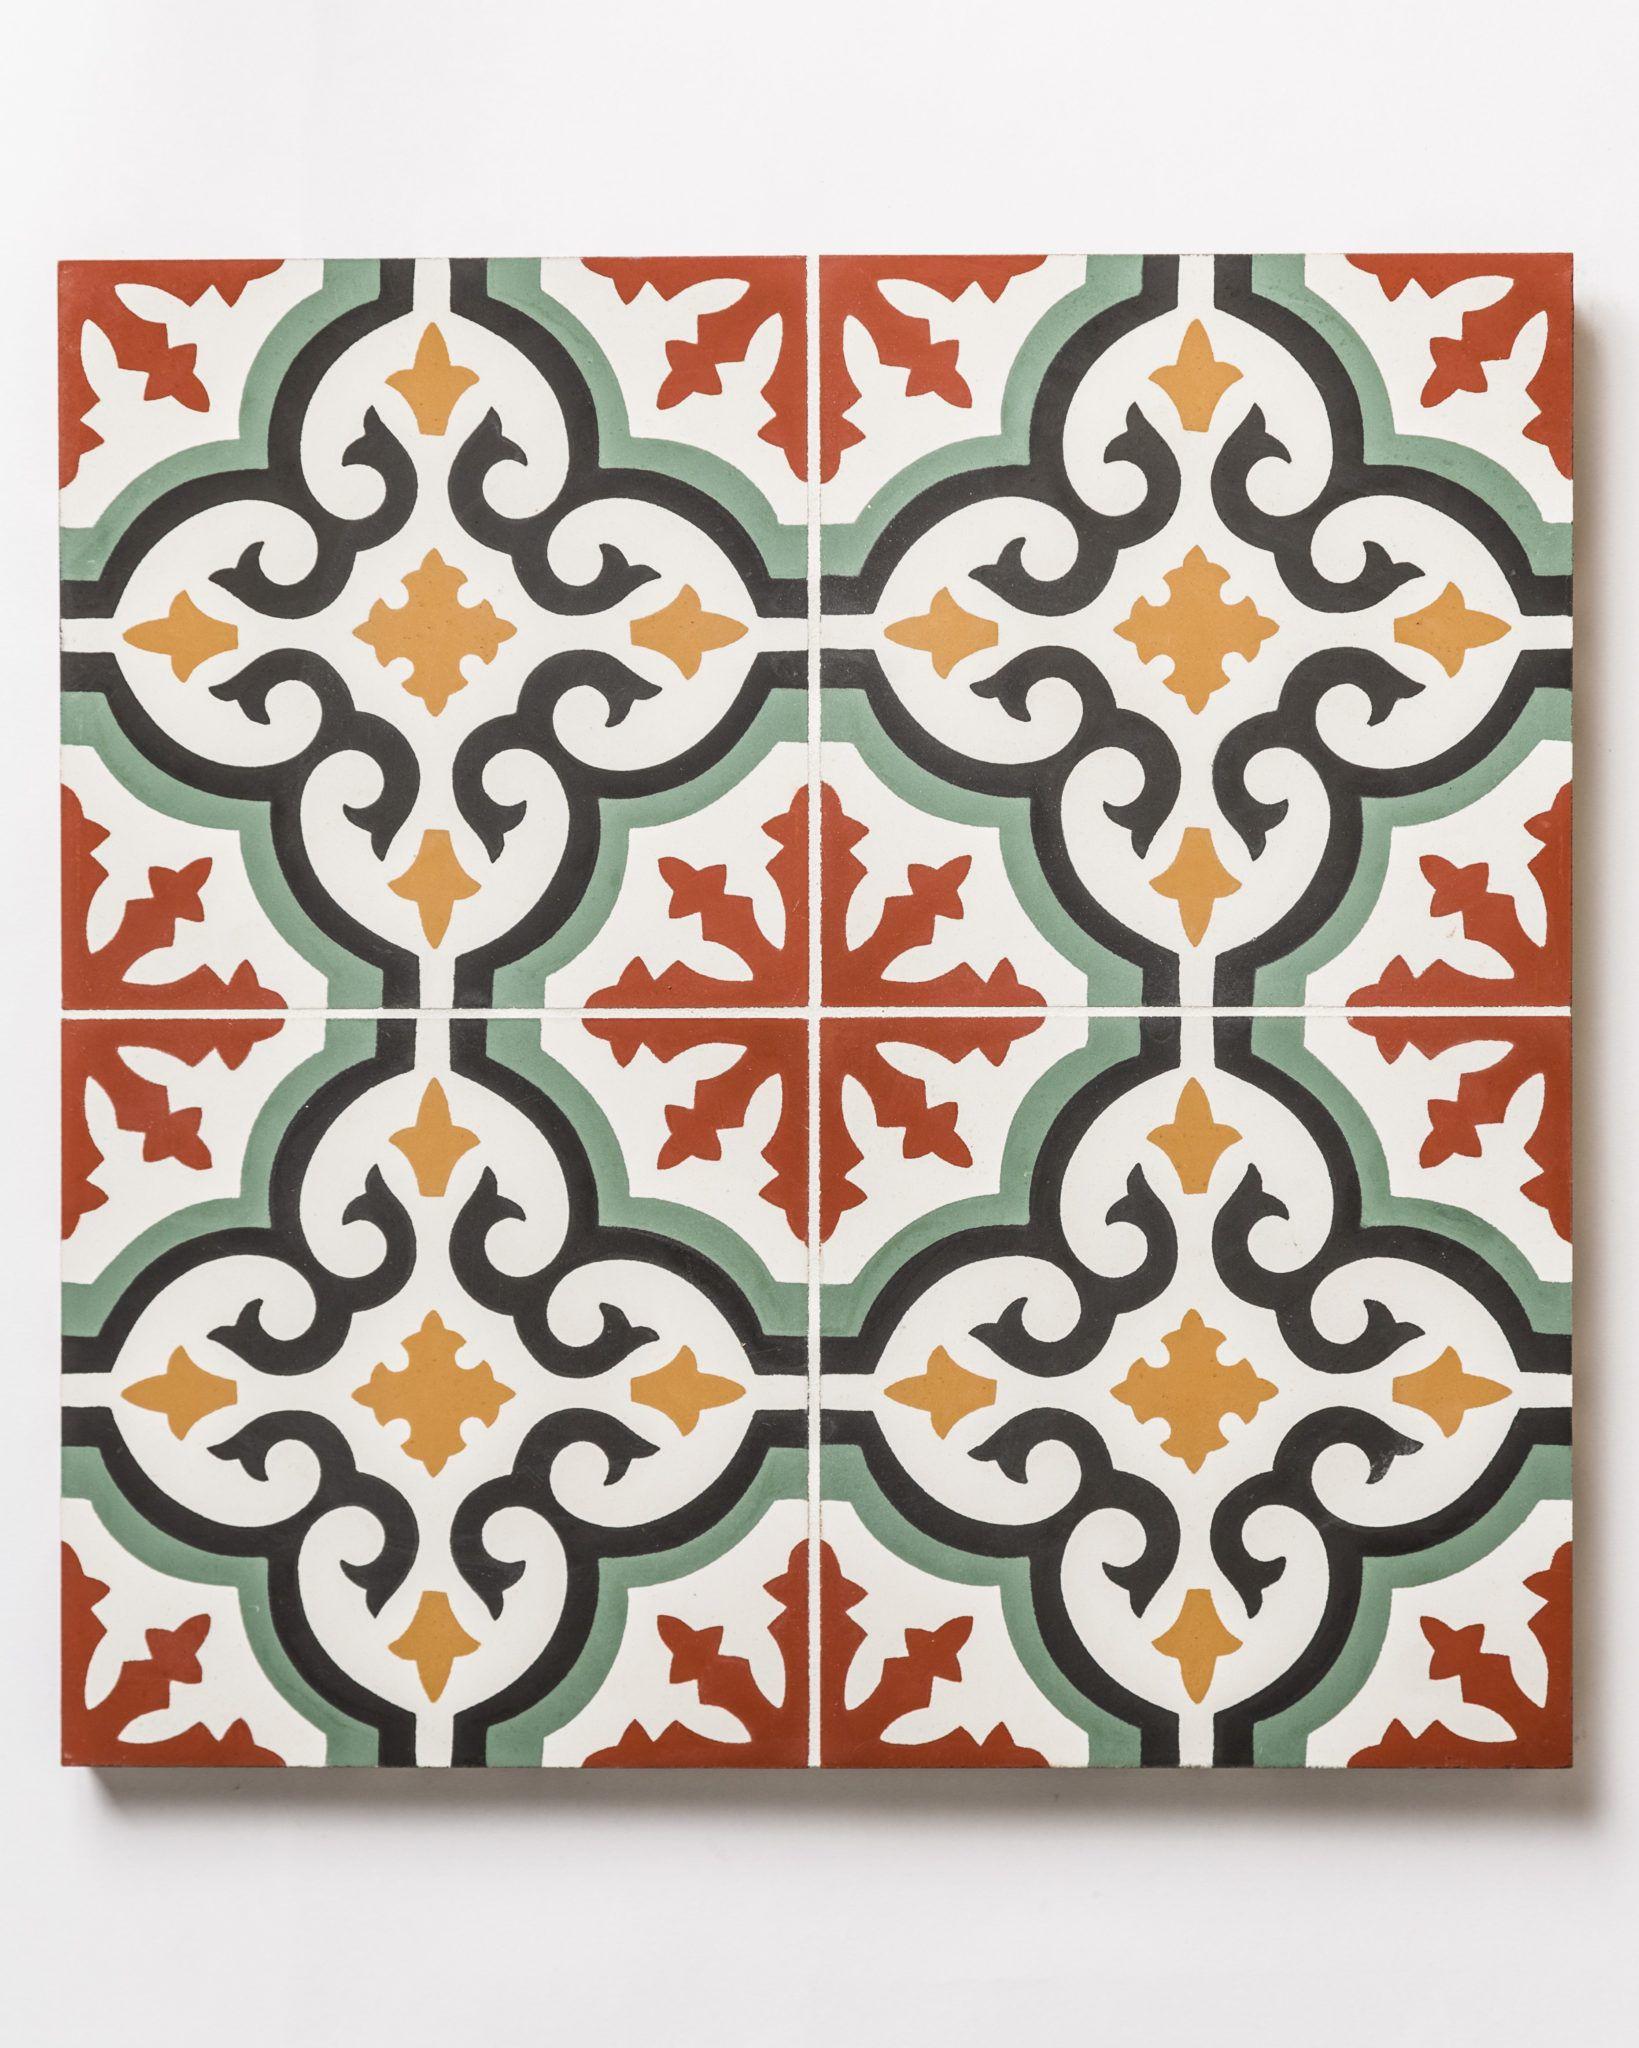 bibao encaustic patterned tile swatch